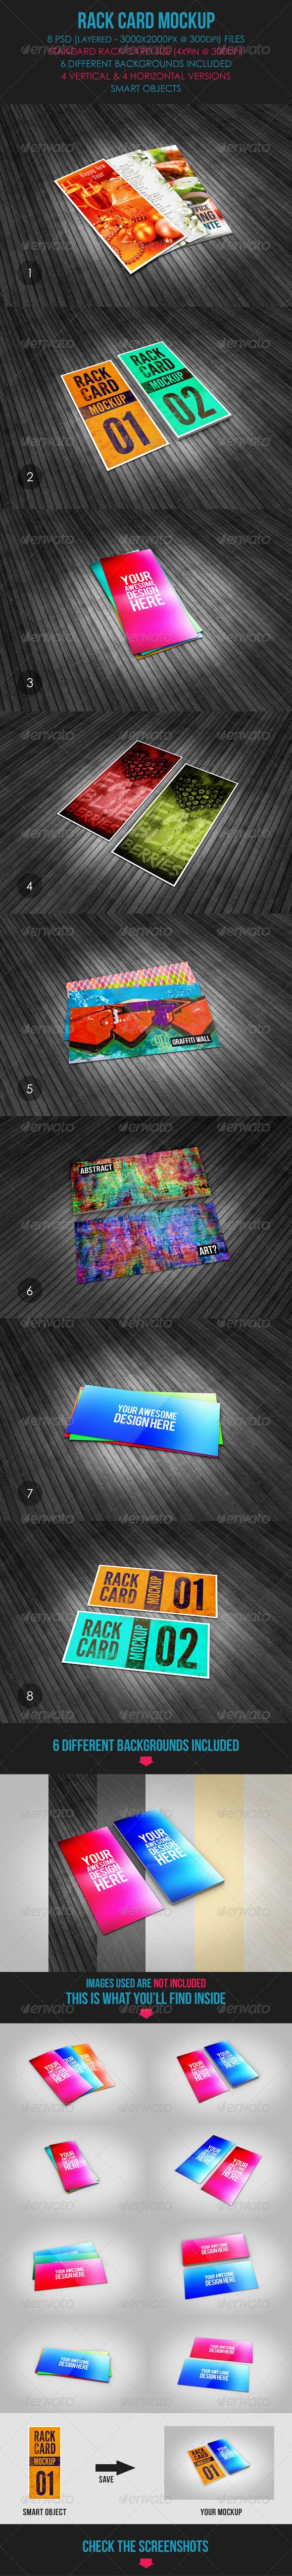 GraphicRiver Rack Card Mockup 5966720